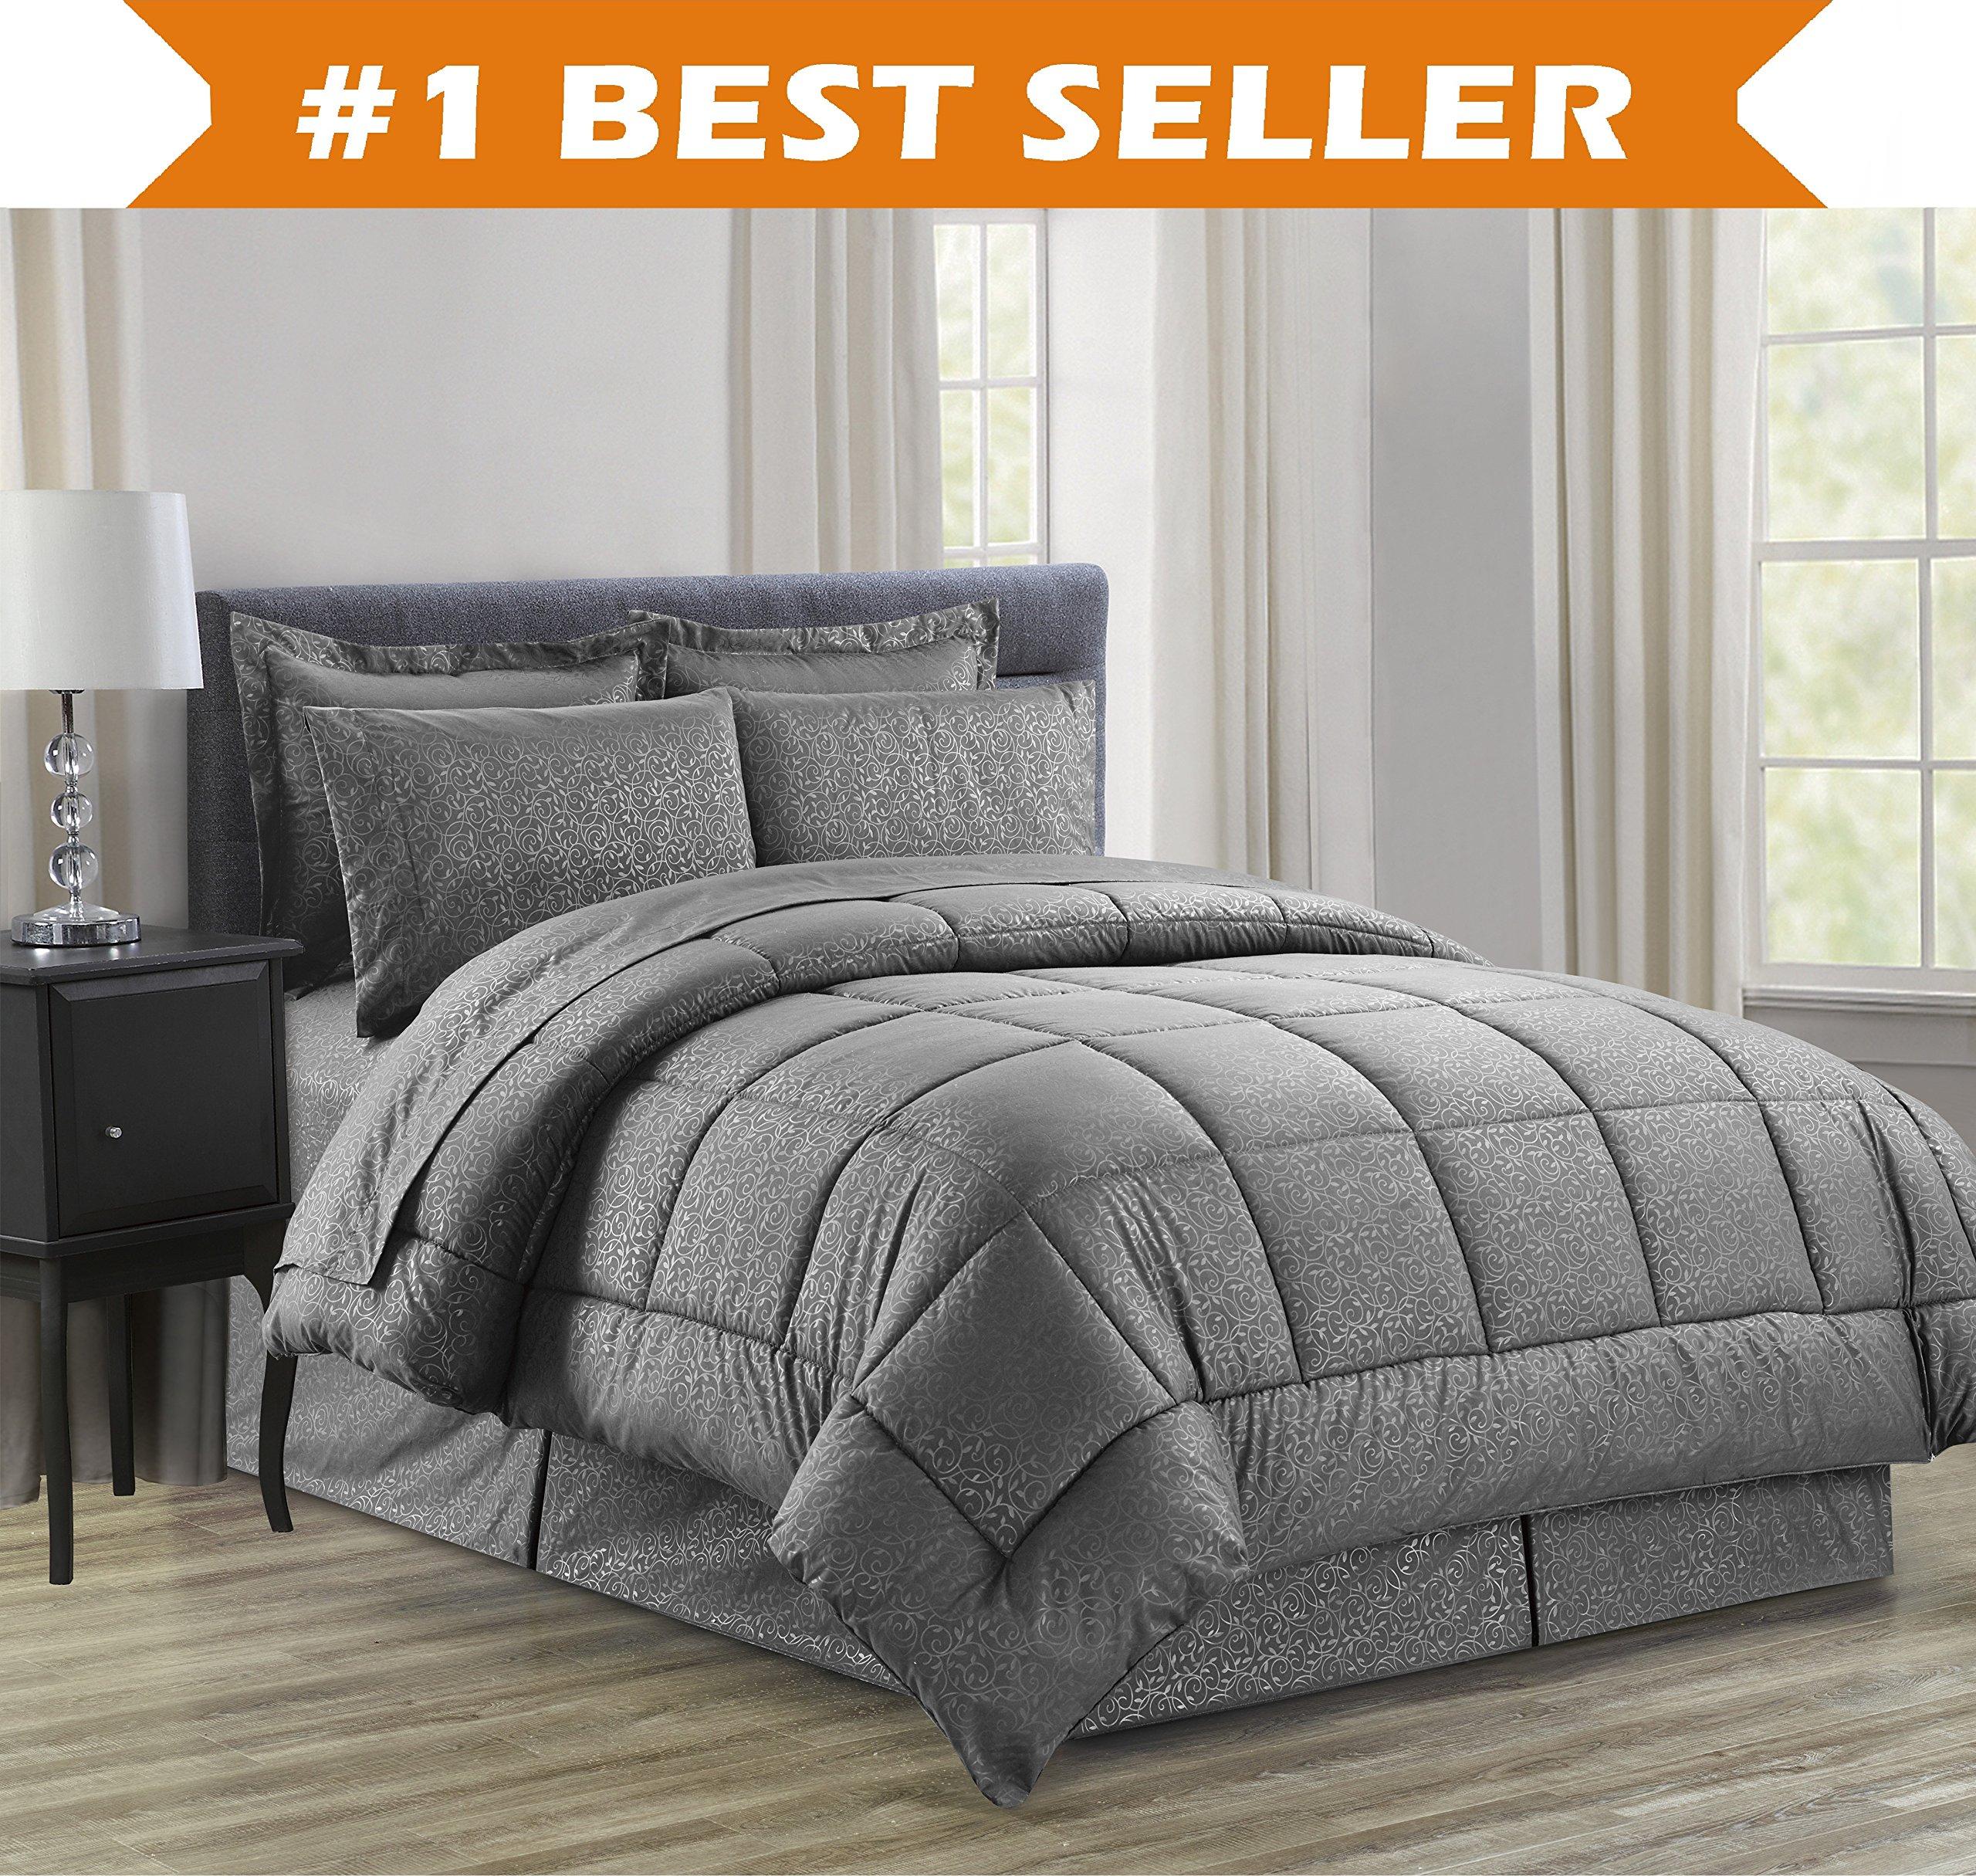 Luxury Bed-in-a-Bag Comforter Set on Amazon! Elegant Comfort Wrinkle Resistant - Silky Soft Beautiful Design Complete Bed-in-a-Bag 8-Piece Comforter Set -Hypoallergenic- King Grey